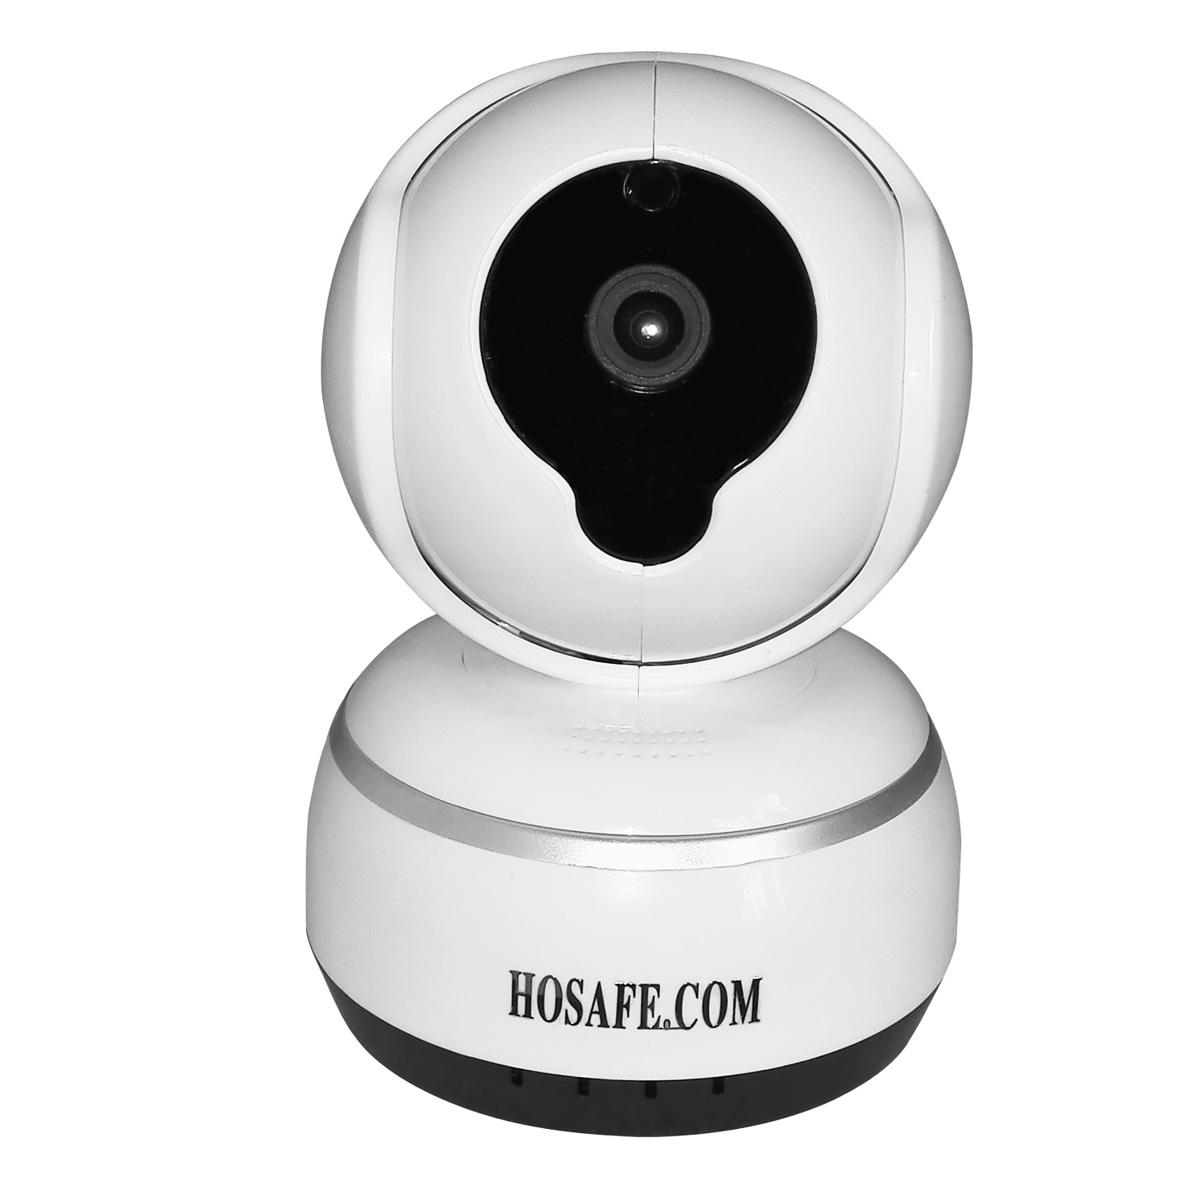 HOSAFECOM Стандарт США new arrival wifi hd ip camera wireless infrared ir cctv security camera network webcam ipcam two way audio motion detection